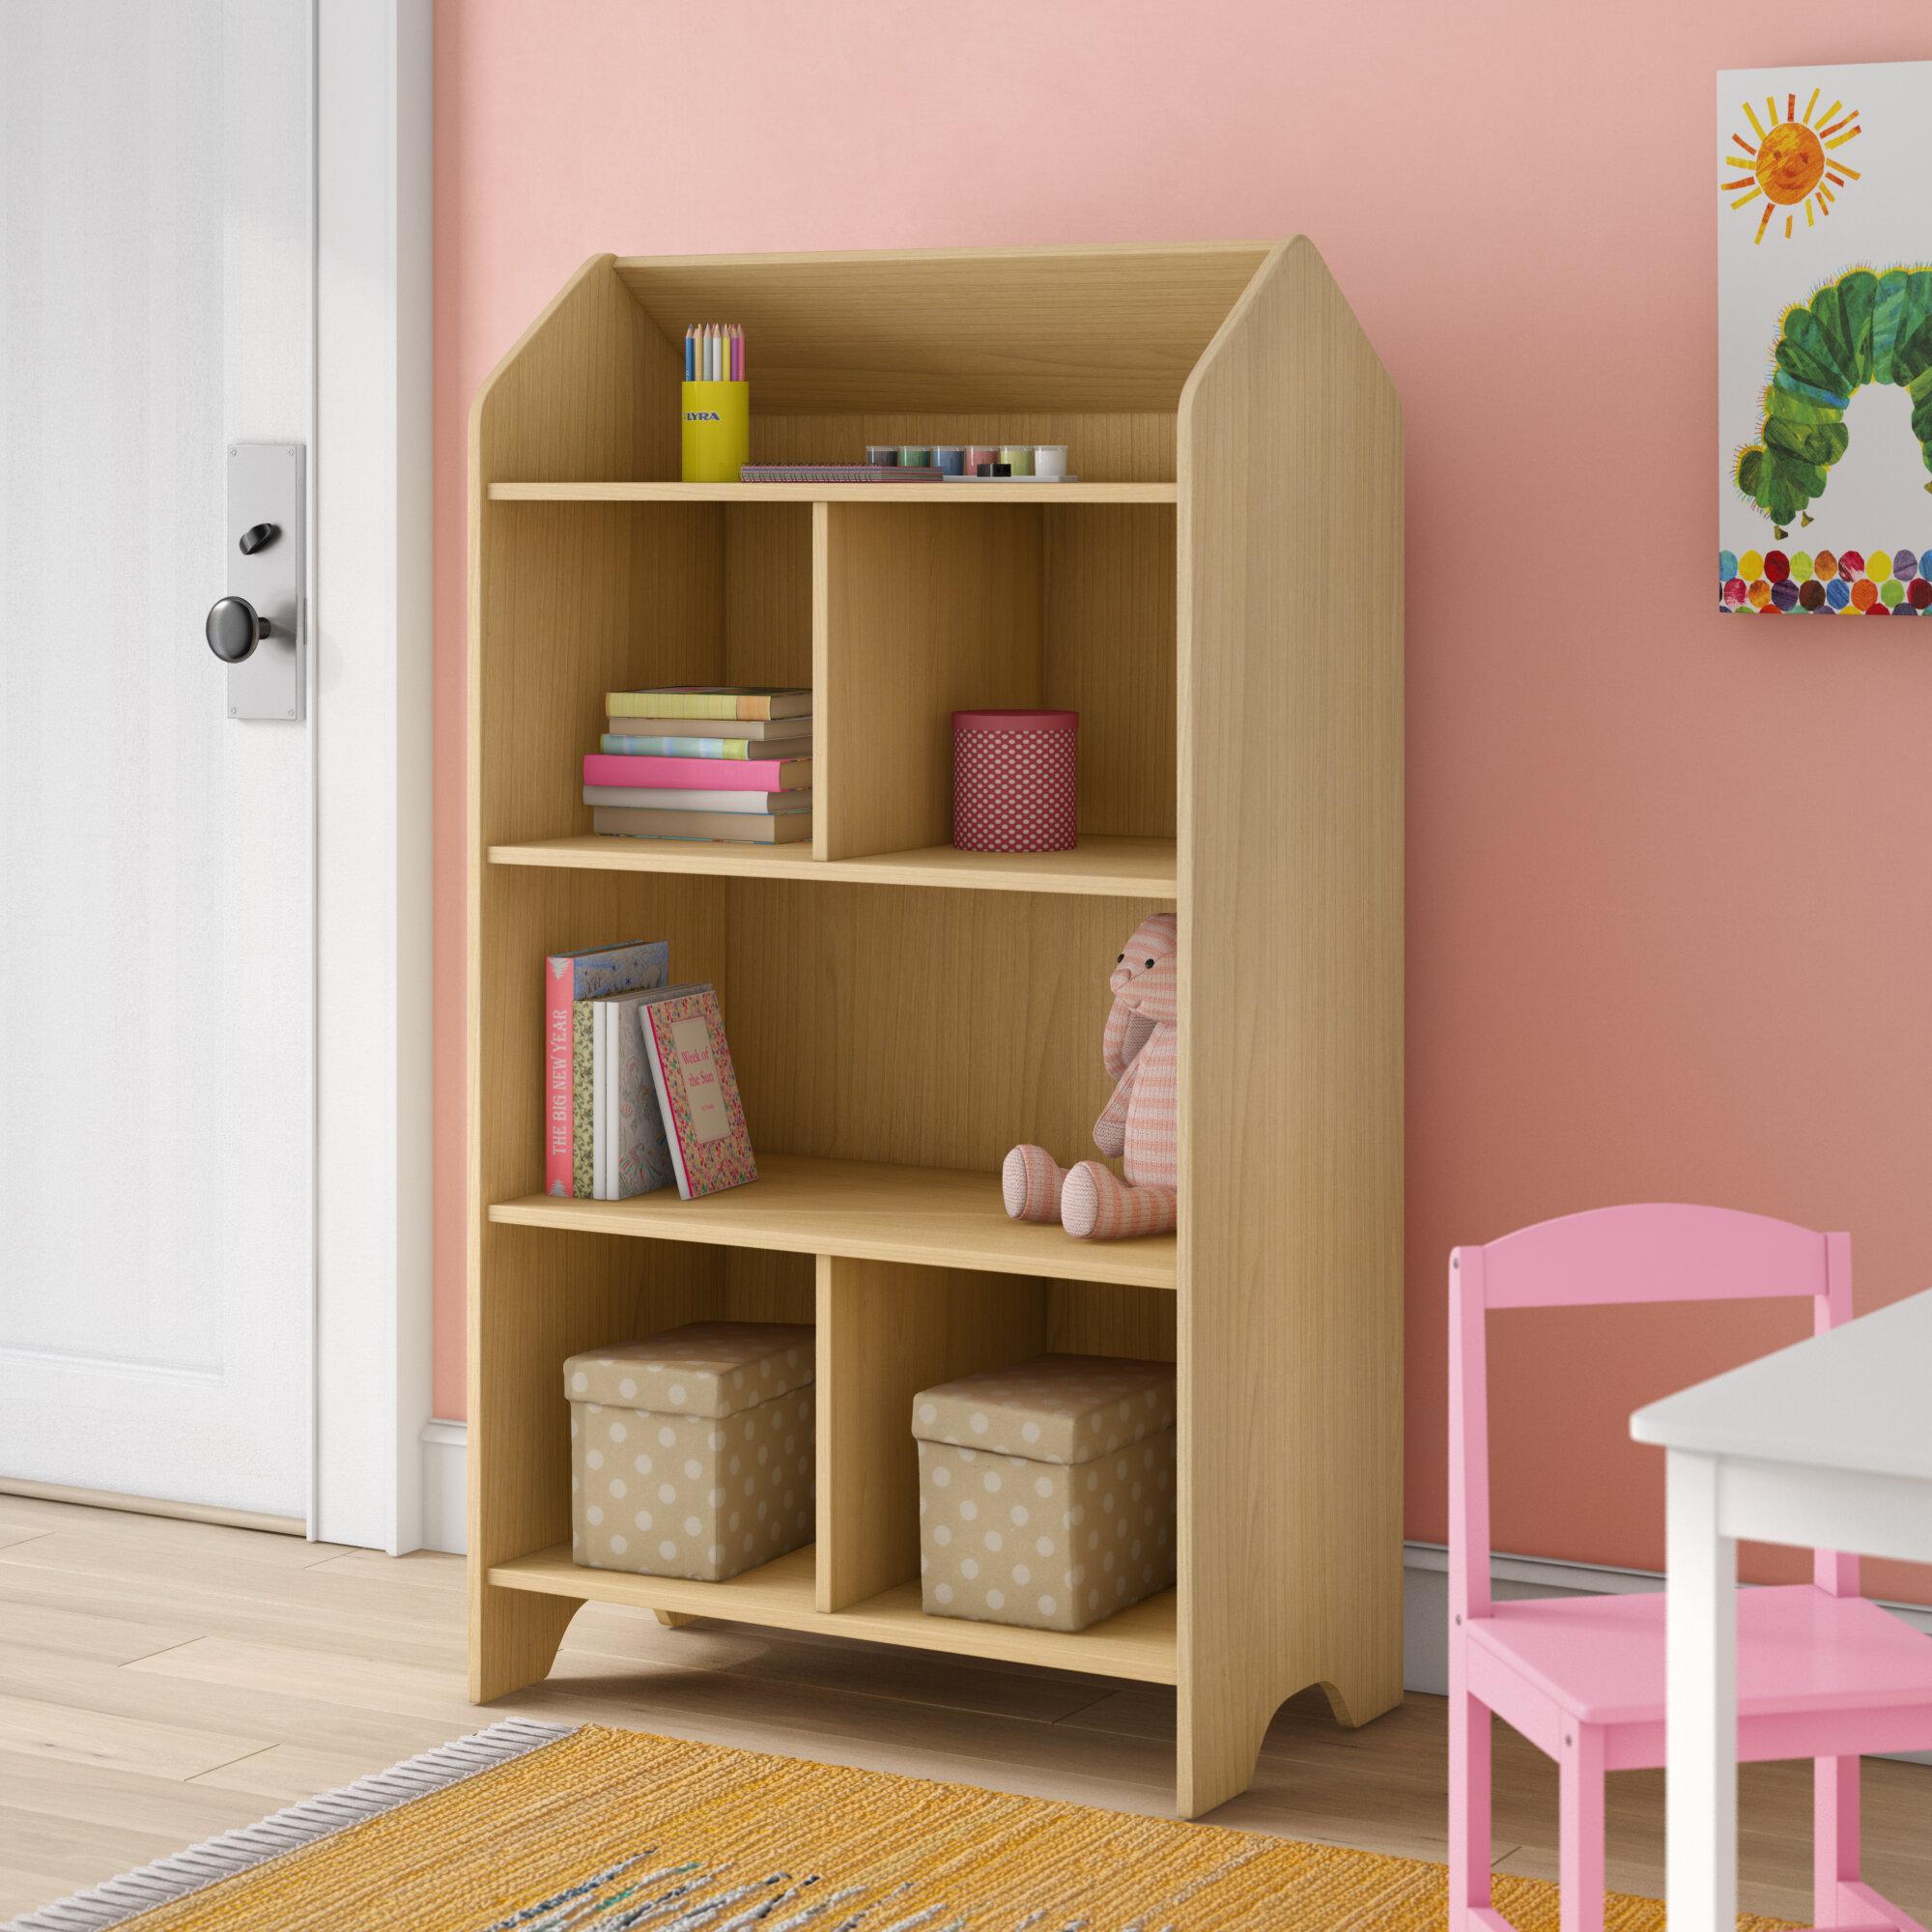 Milled Wooden Dollhouse Toy Wayfair